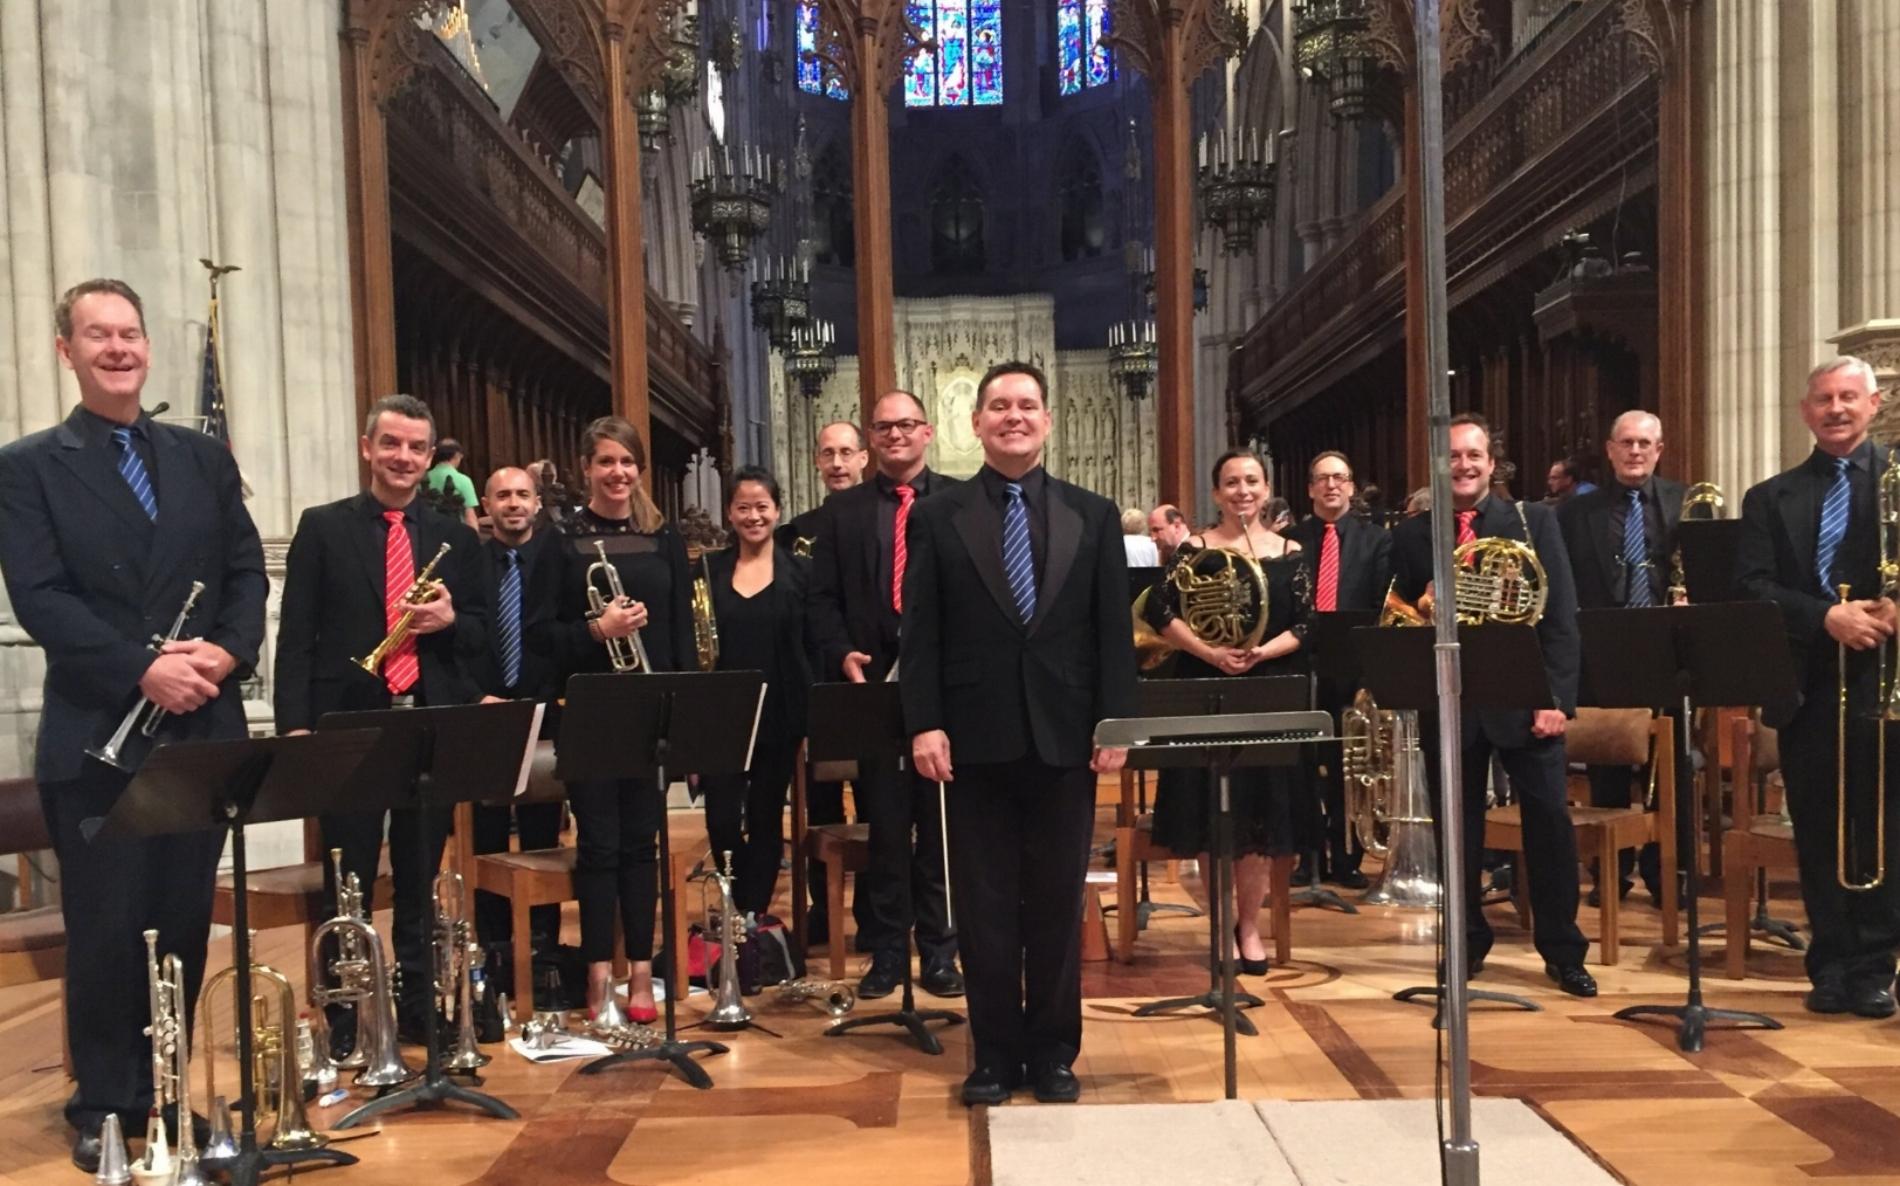 The Washington Symphonic Brass